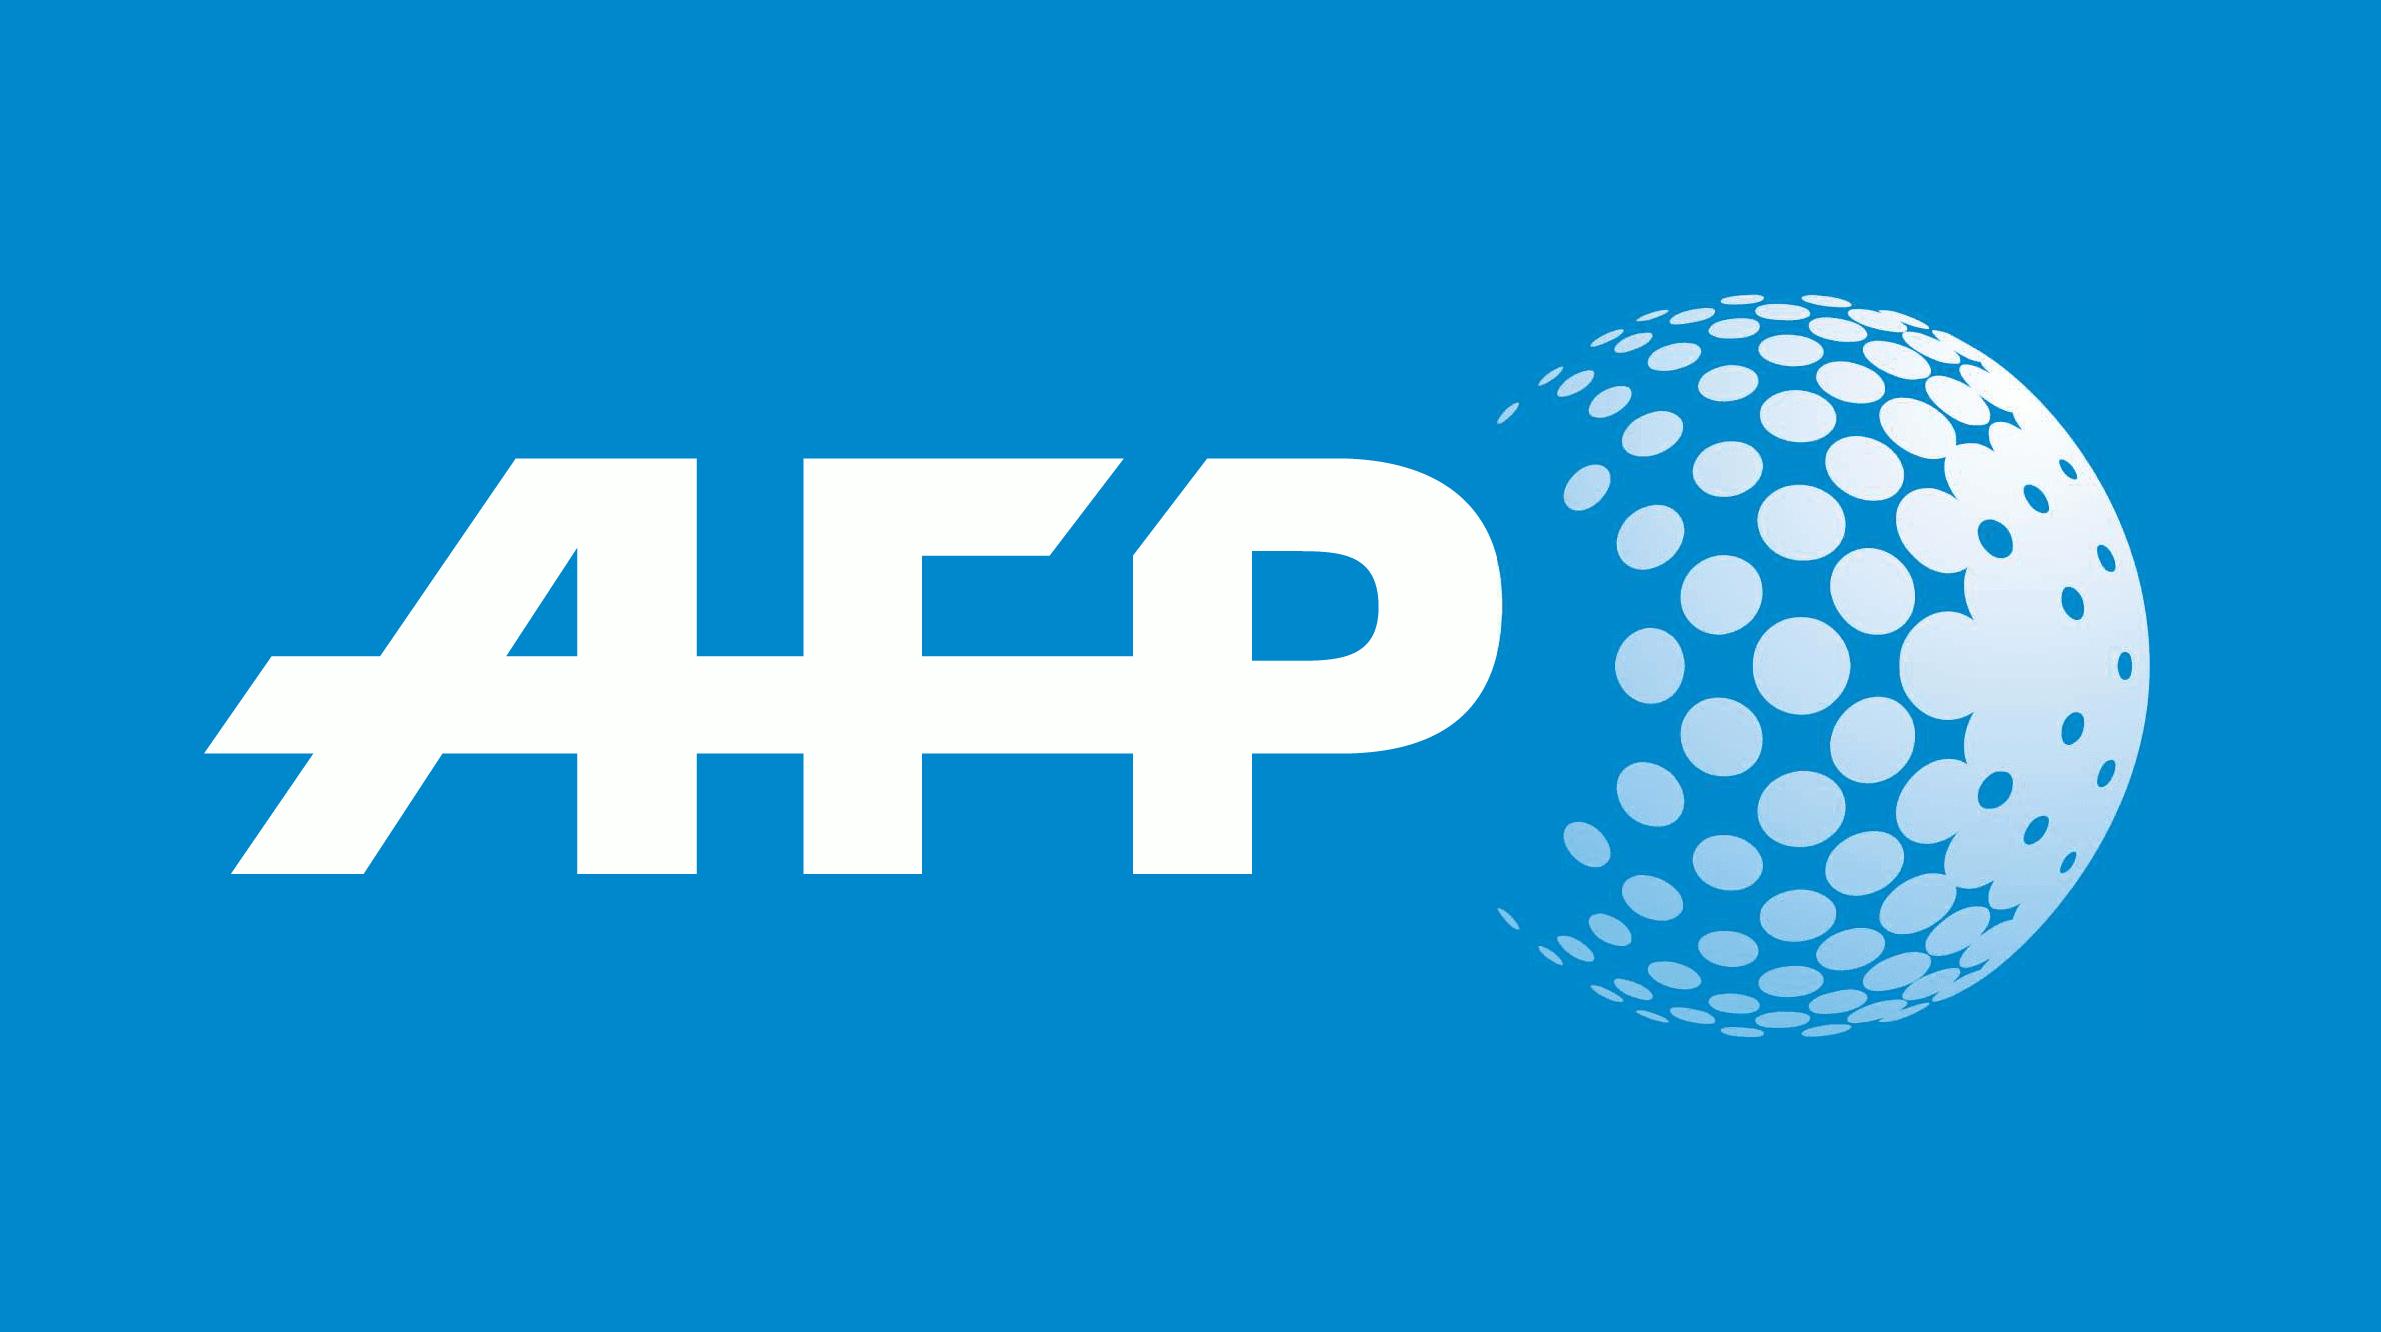 AFP Logo Vector EPS Free Download, Logo, Icons, Brand Emblems